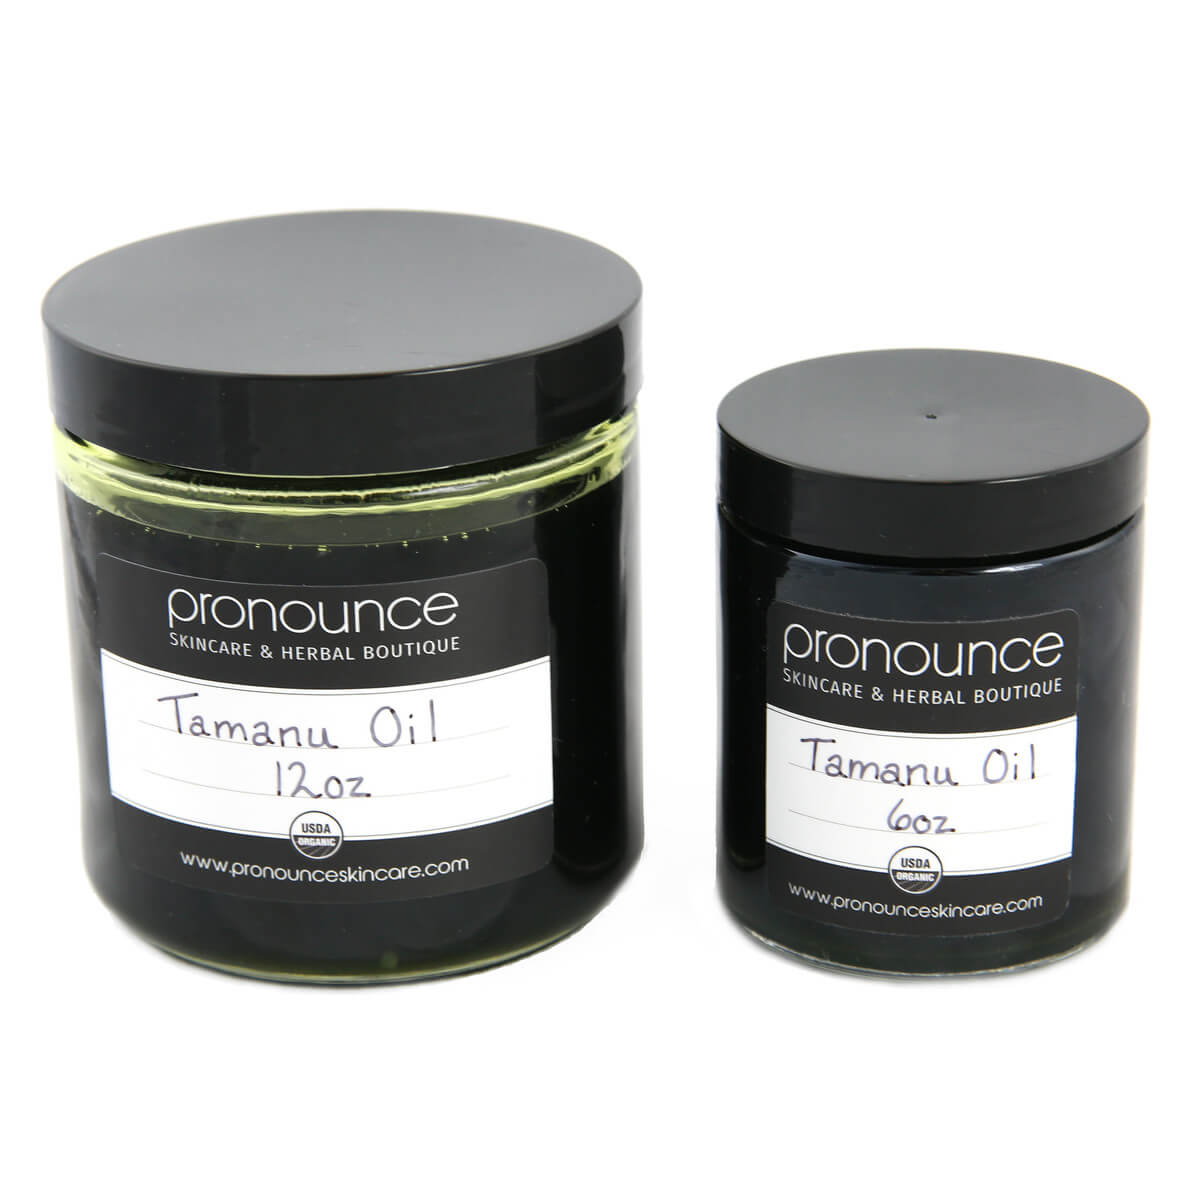 Certified Organic Tamanu Oil 2 Sizes Pronounce Skincare & Herbal Boutique